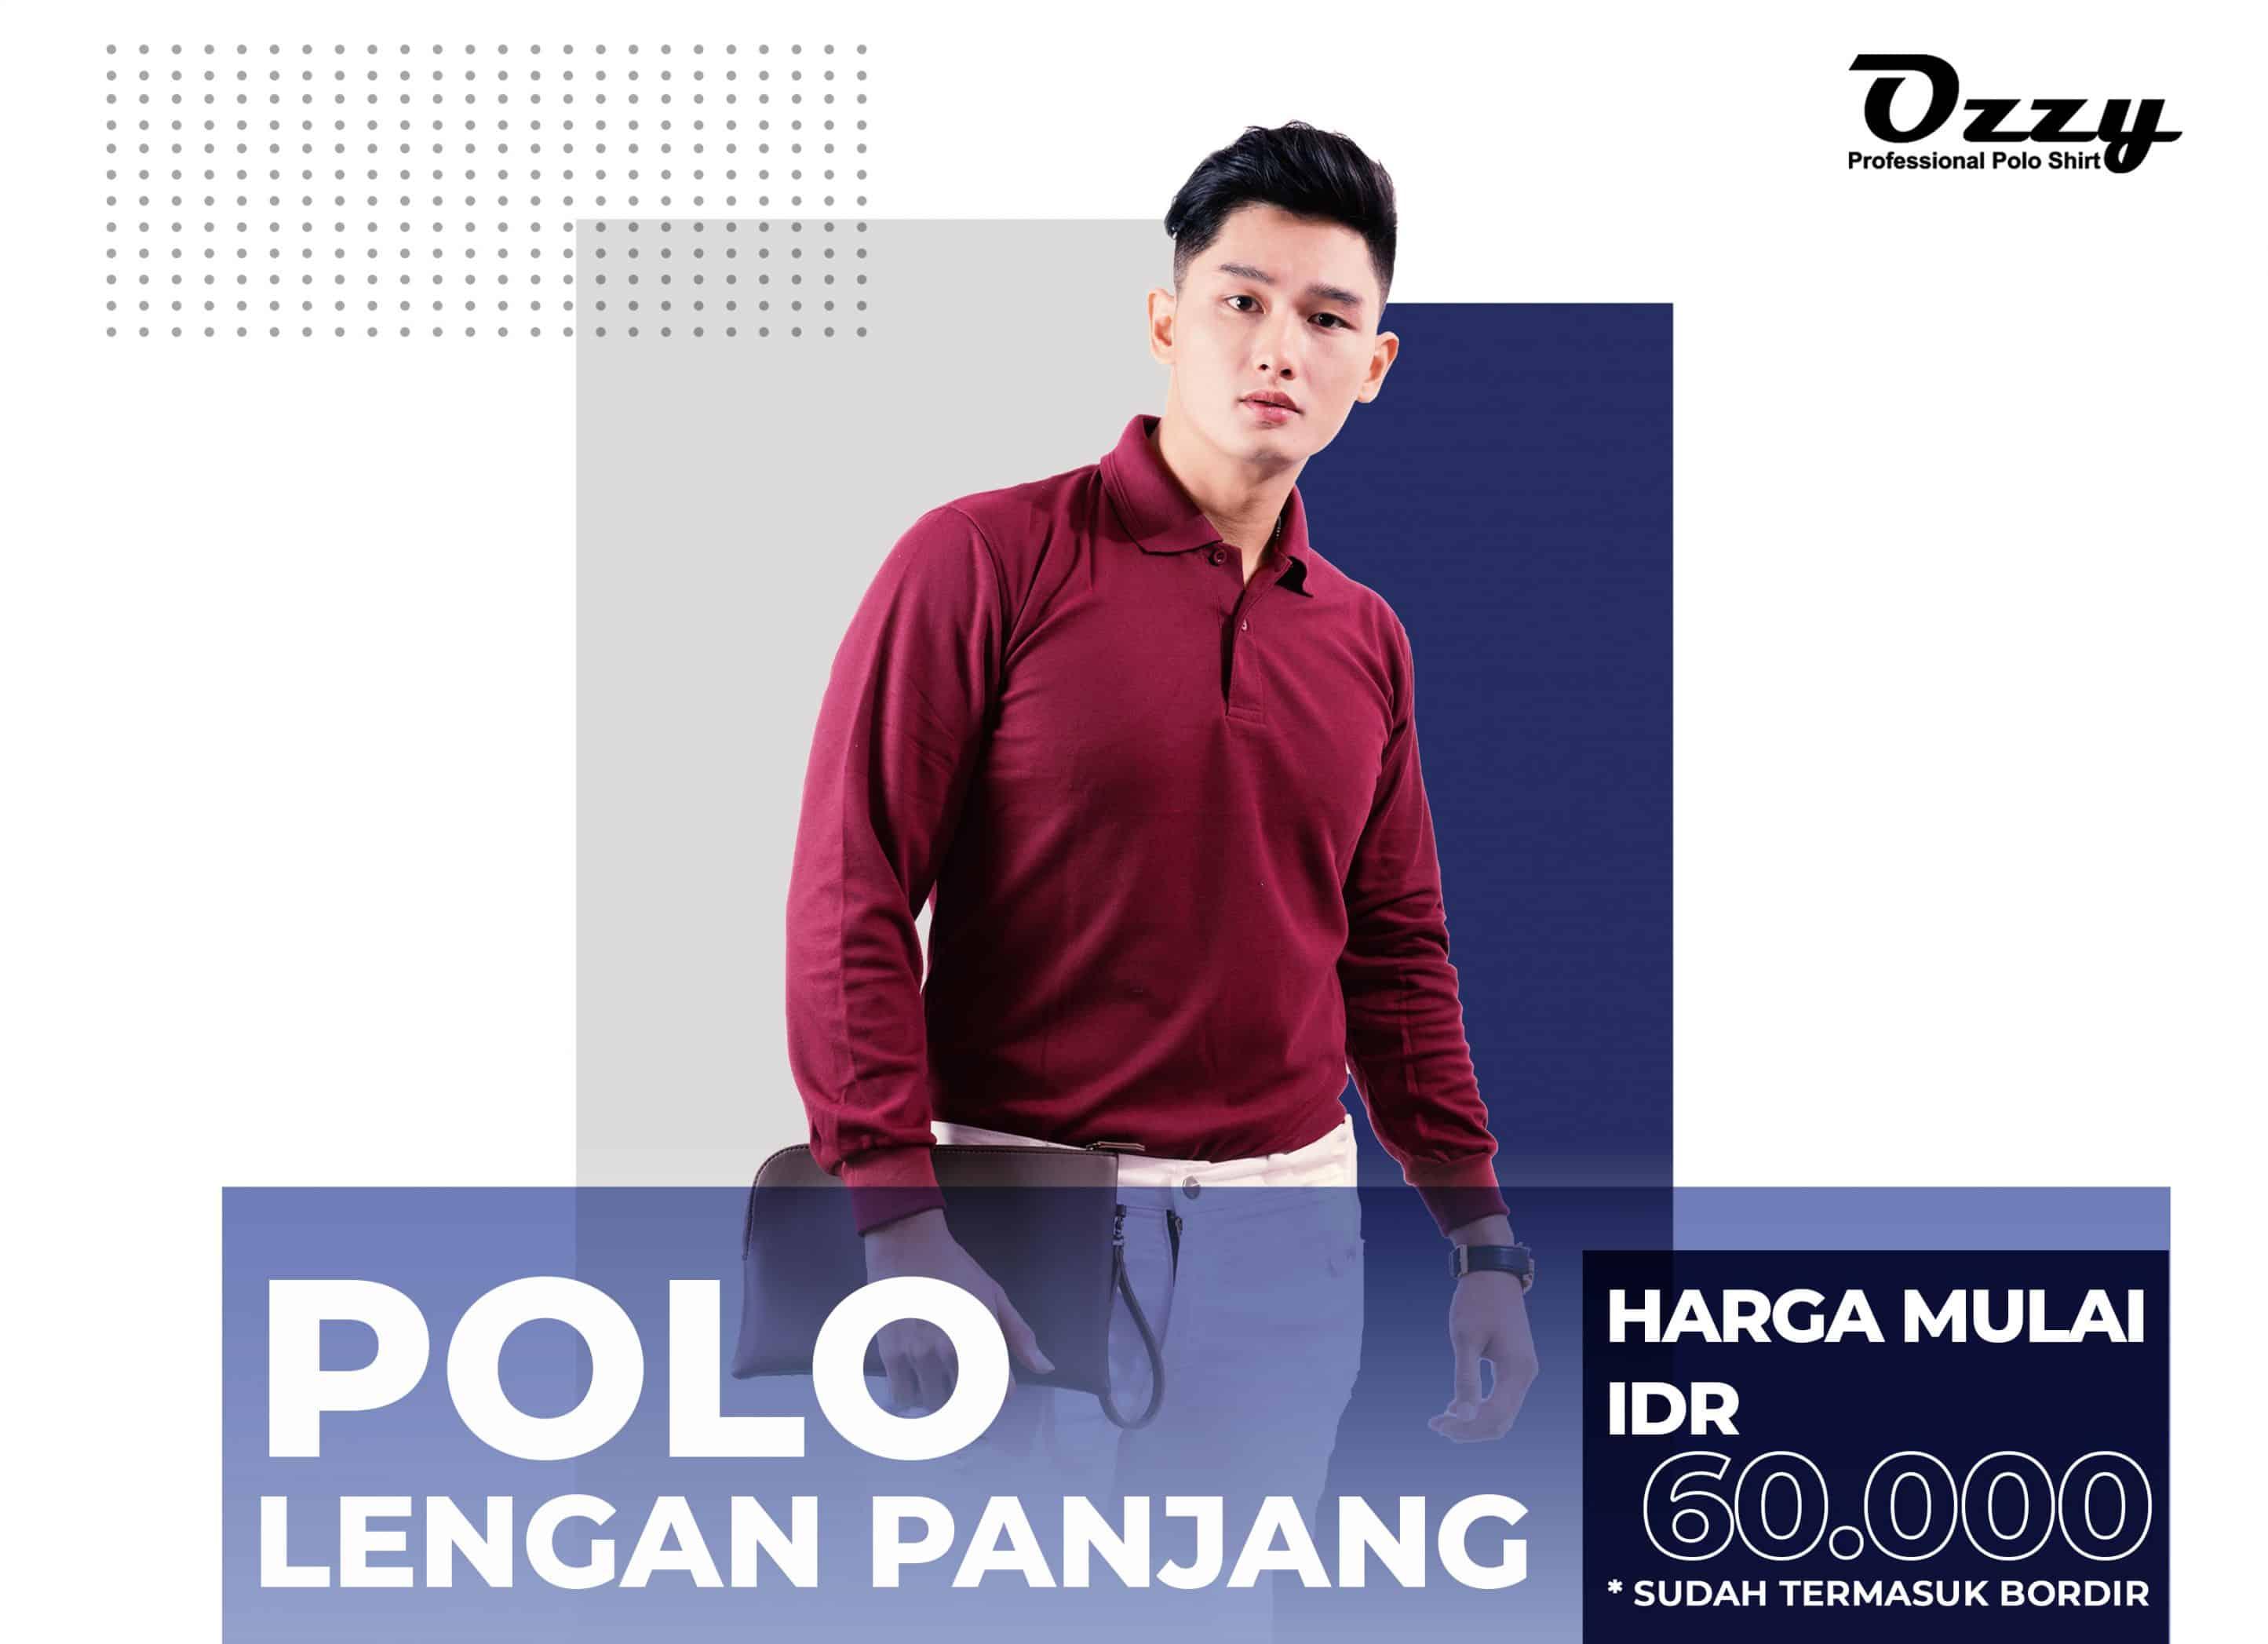 Kaos Polo Jogja Murah - Grosir Polo Jogja - Polos - Ozzy Clothing